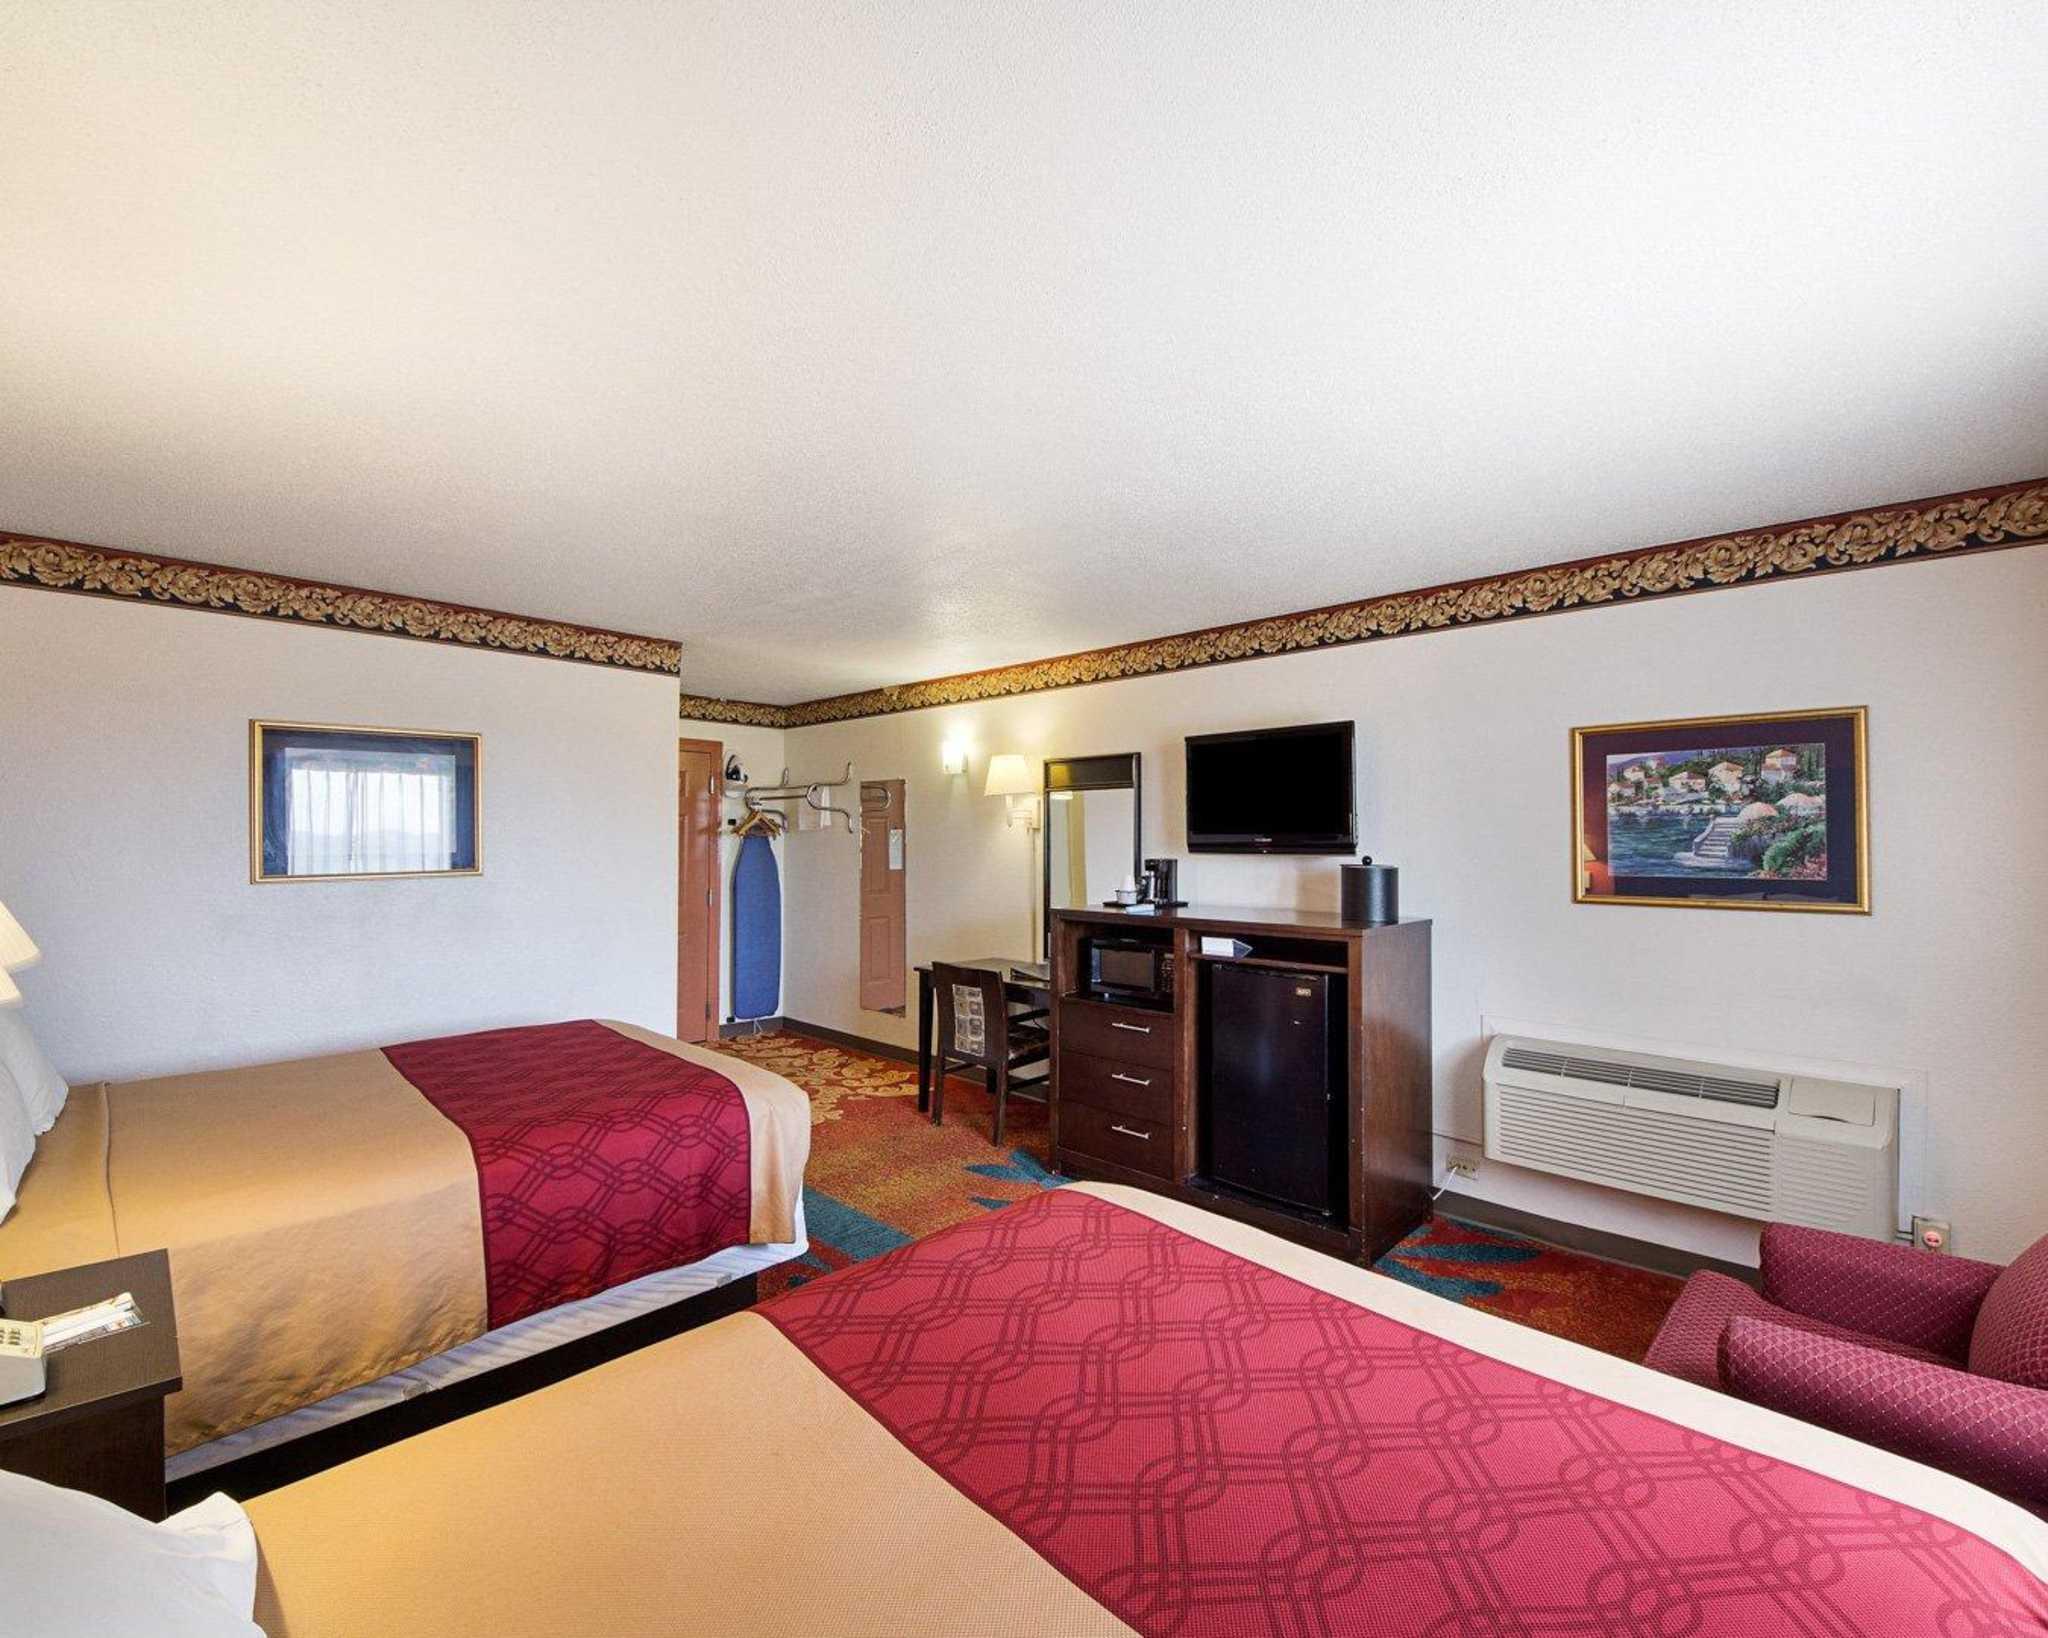 Rodeway Inn At Lackland AFB image 9